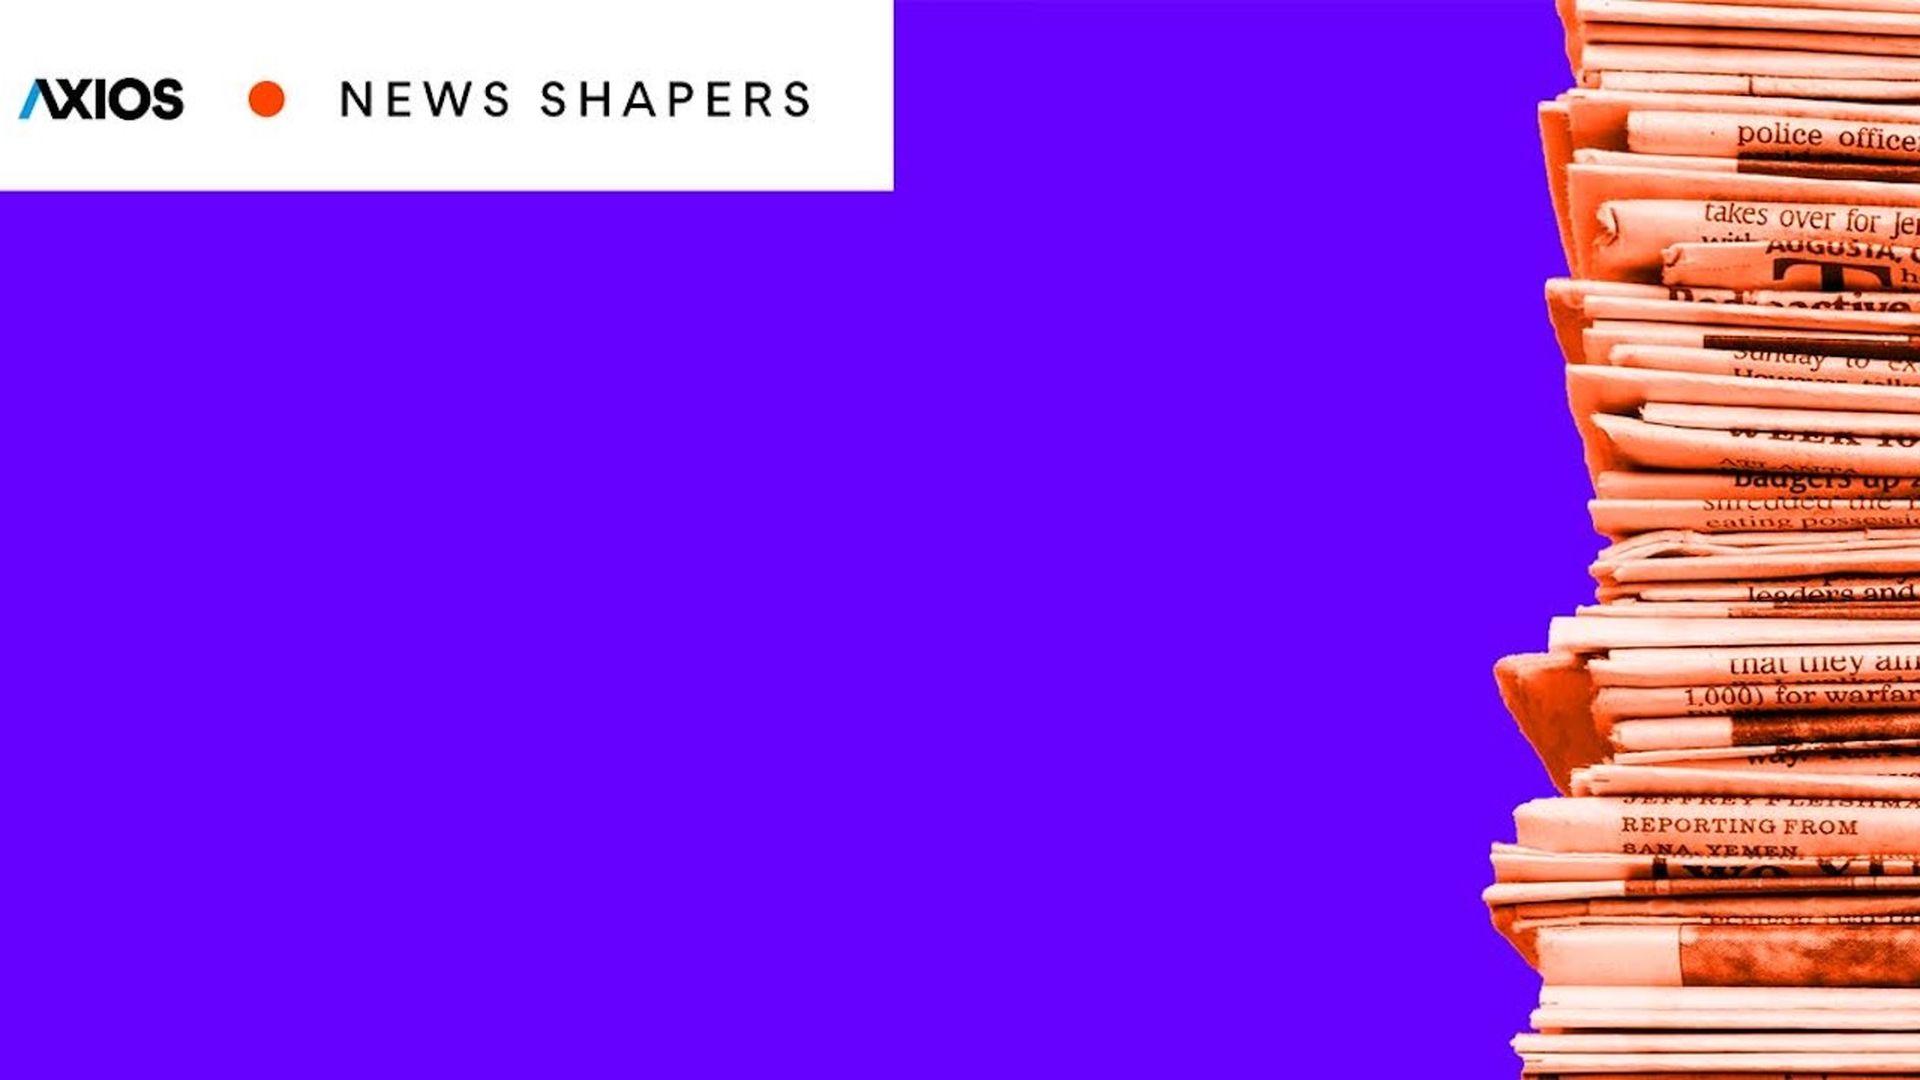 News Shapers logo